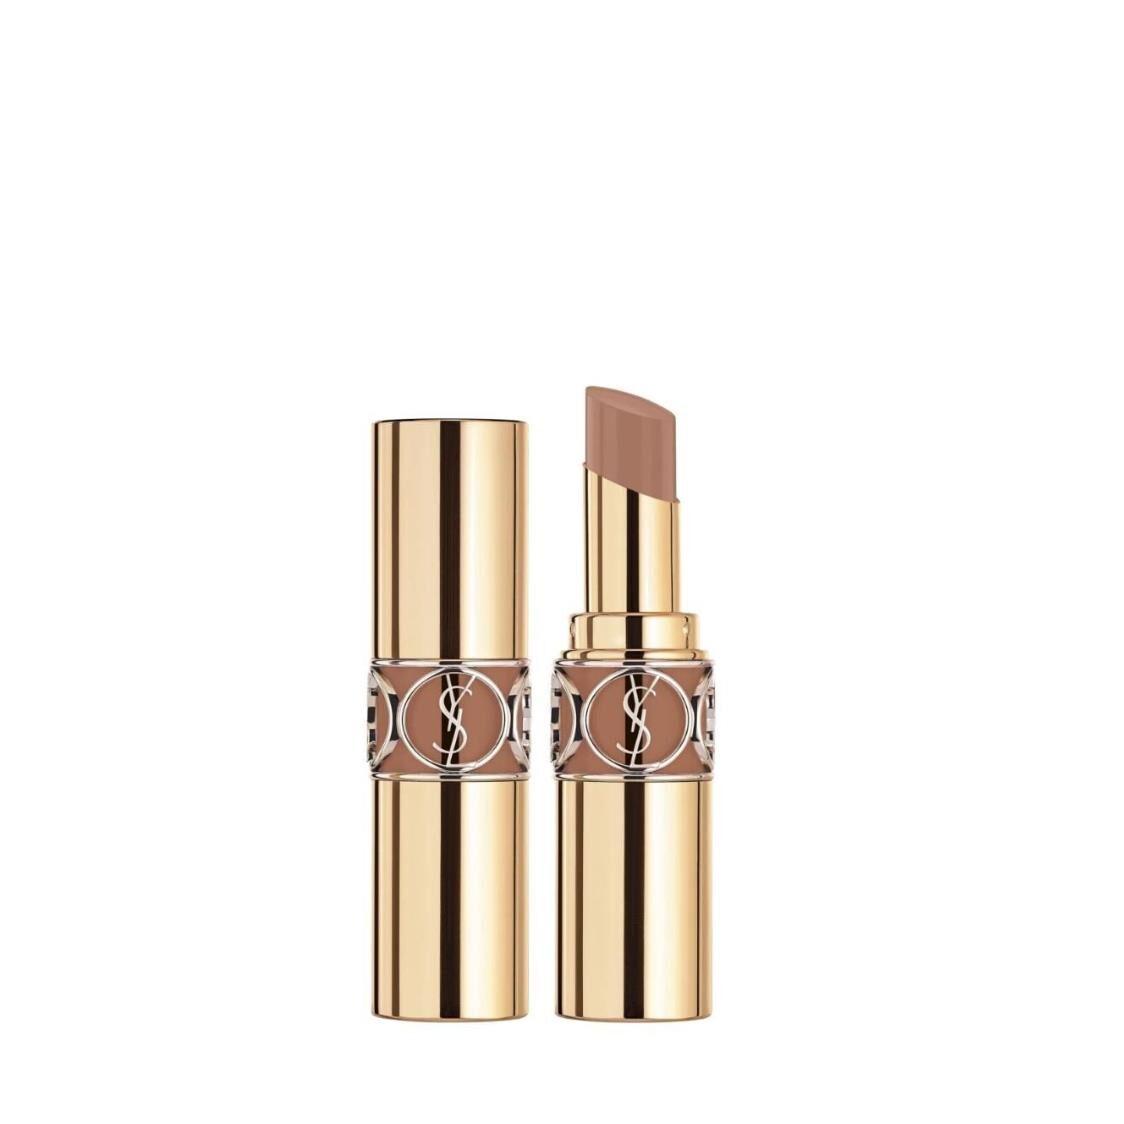 Yves Saint Laurent Beaute Rouge Volupte Shine Spring Summer 2021 Collection